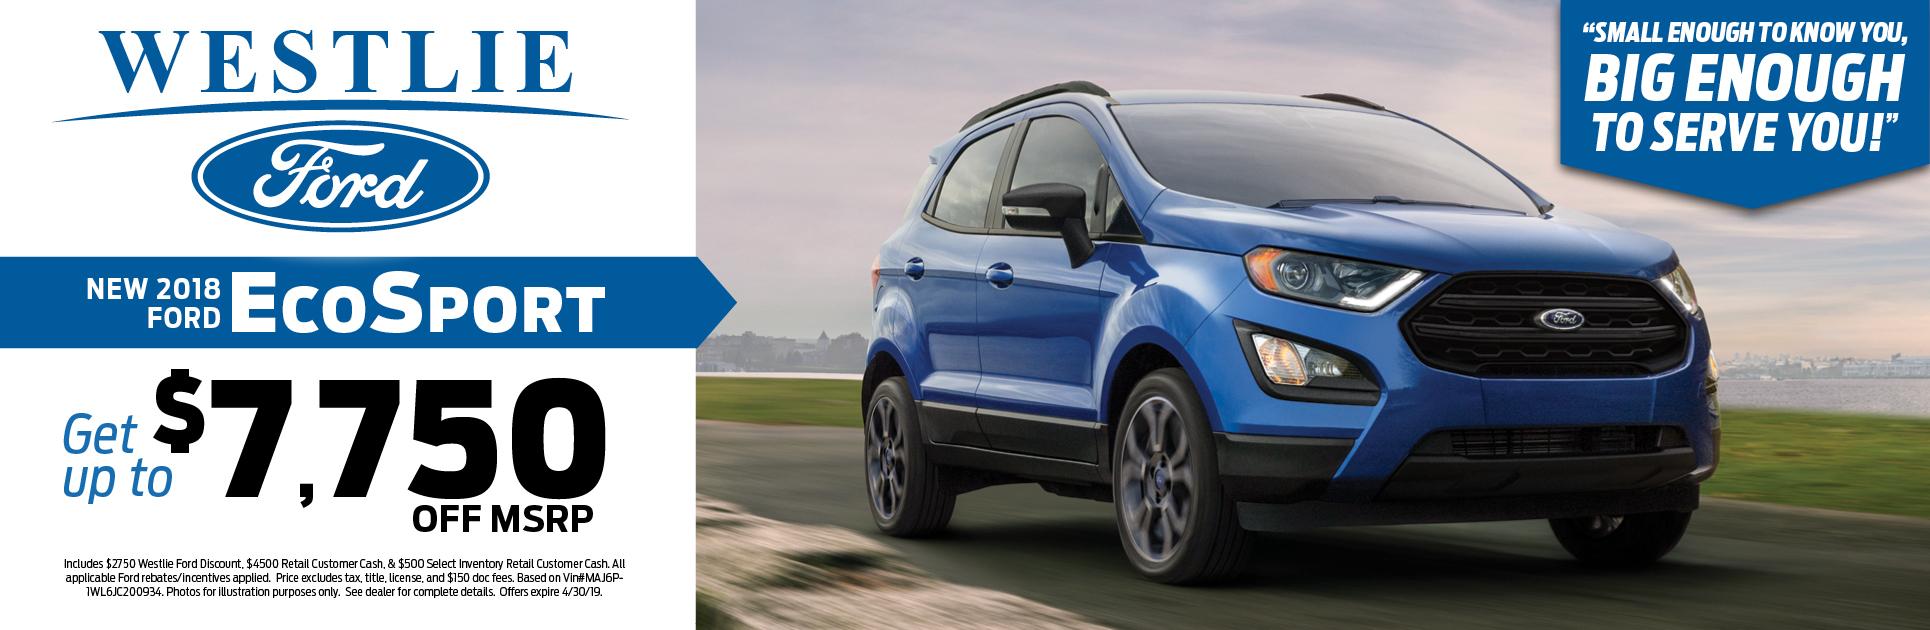 2018-Ford-EcoSport_1